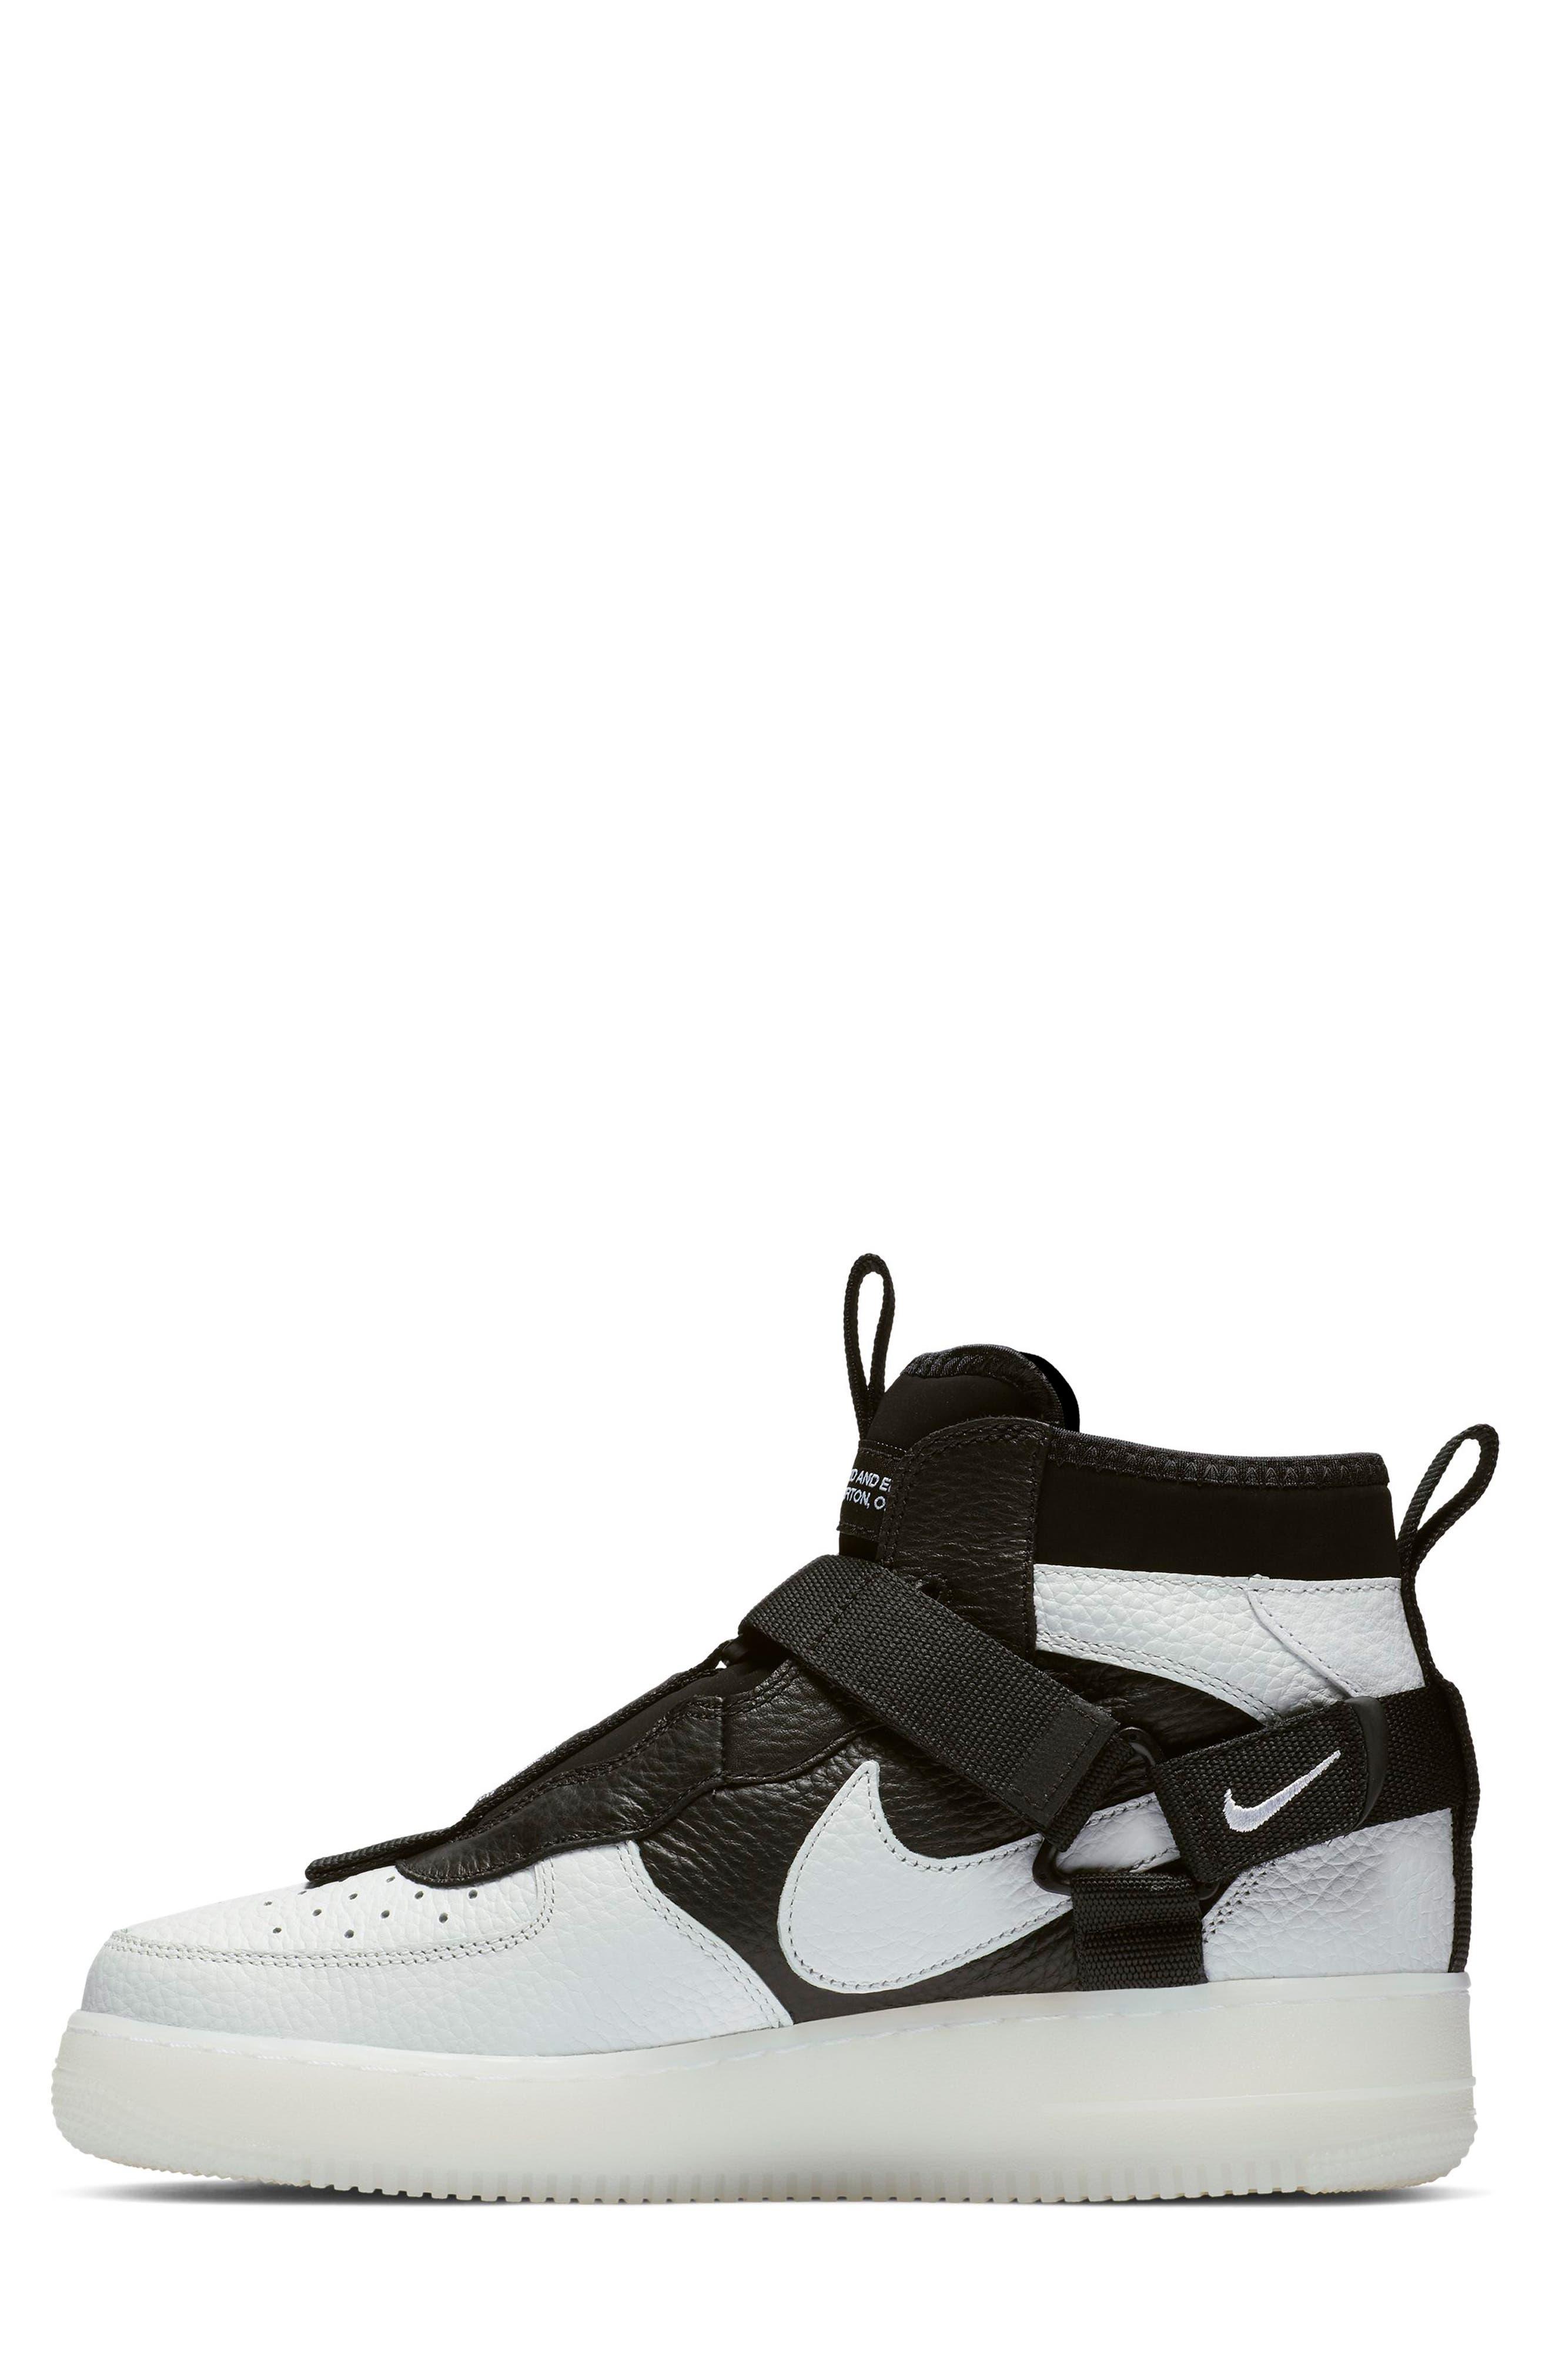 NIKE, Air Force 1 Utility Mid Sneaker, Alternate thumbnail 3, color, OFF WHITE/ BLACK/ WHITE